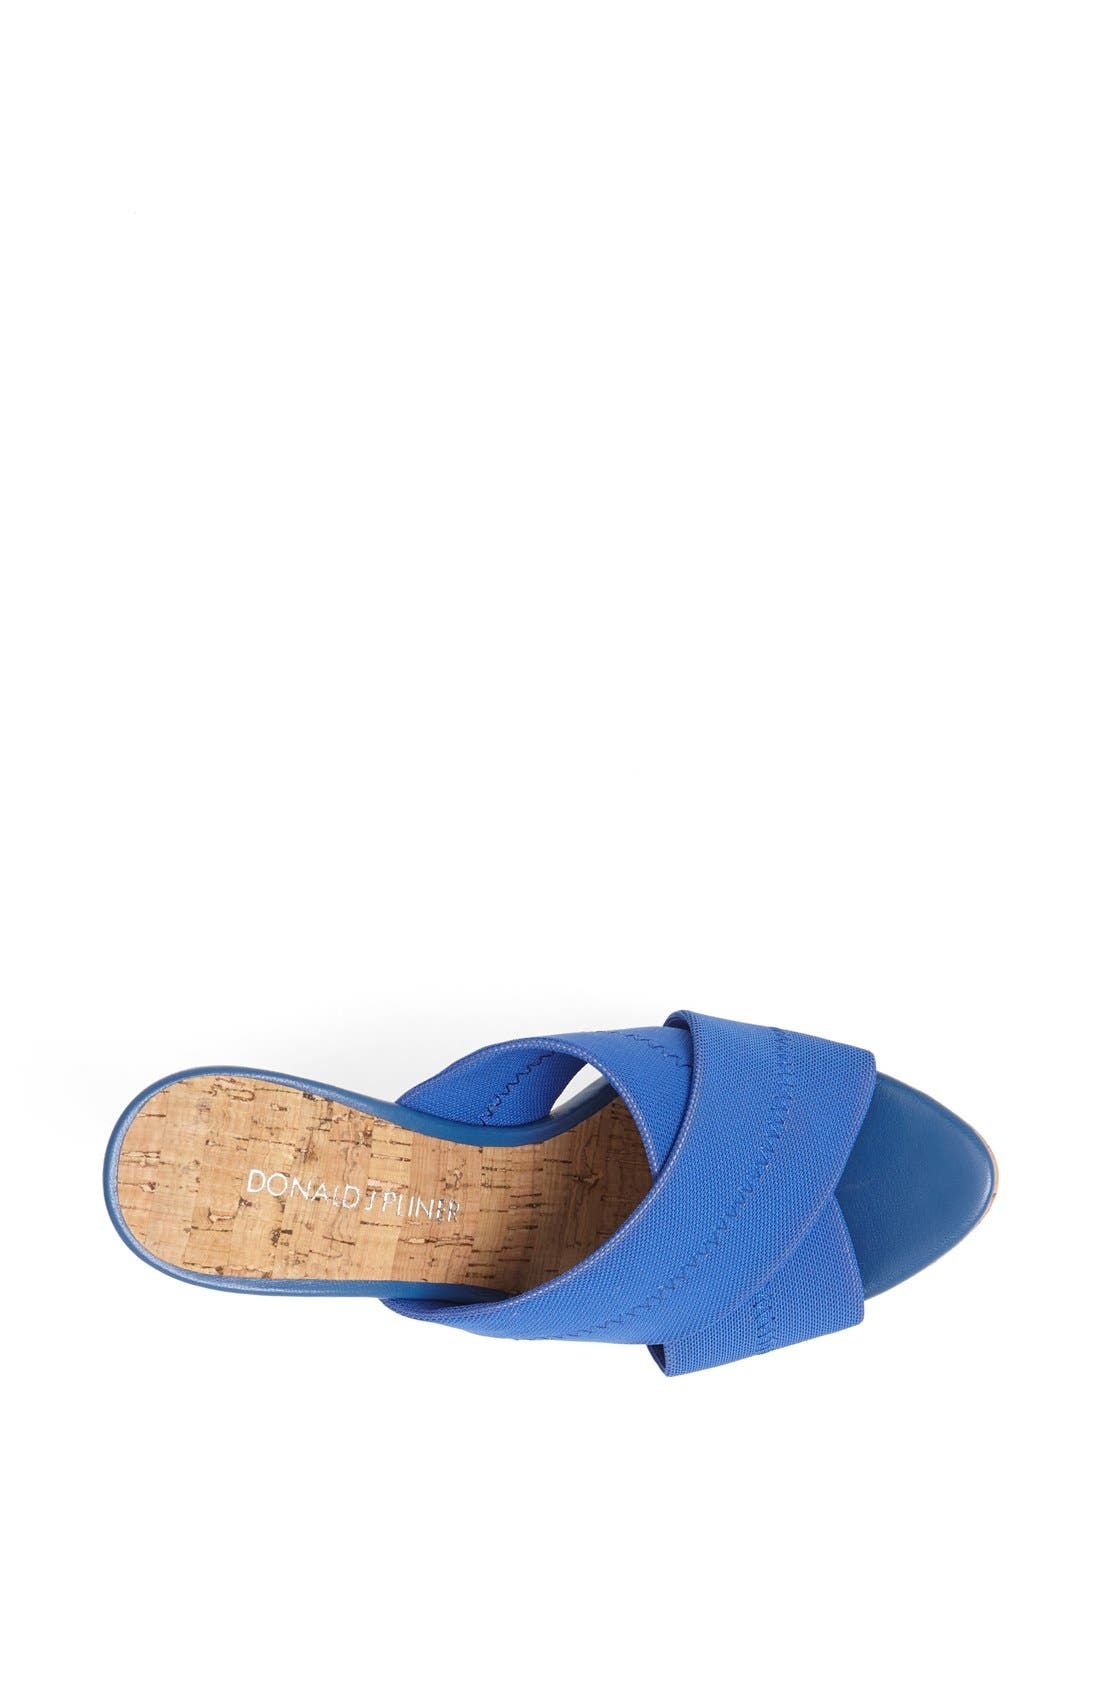 Alternate Image 3  - Donald J Pliner 'Kaz' Wedge Sandal